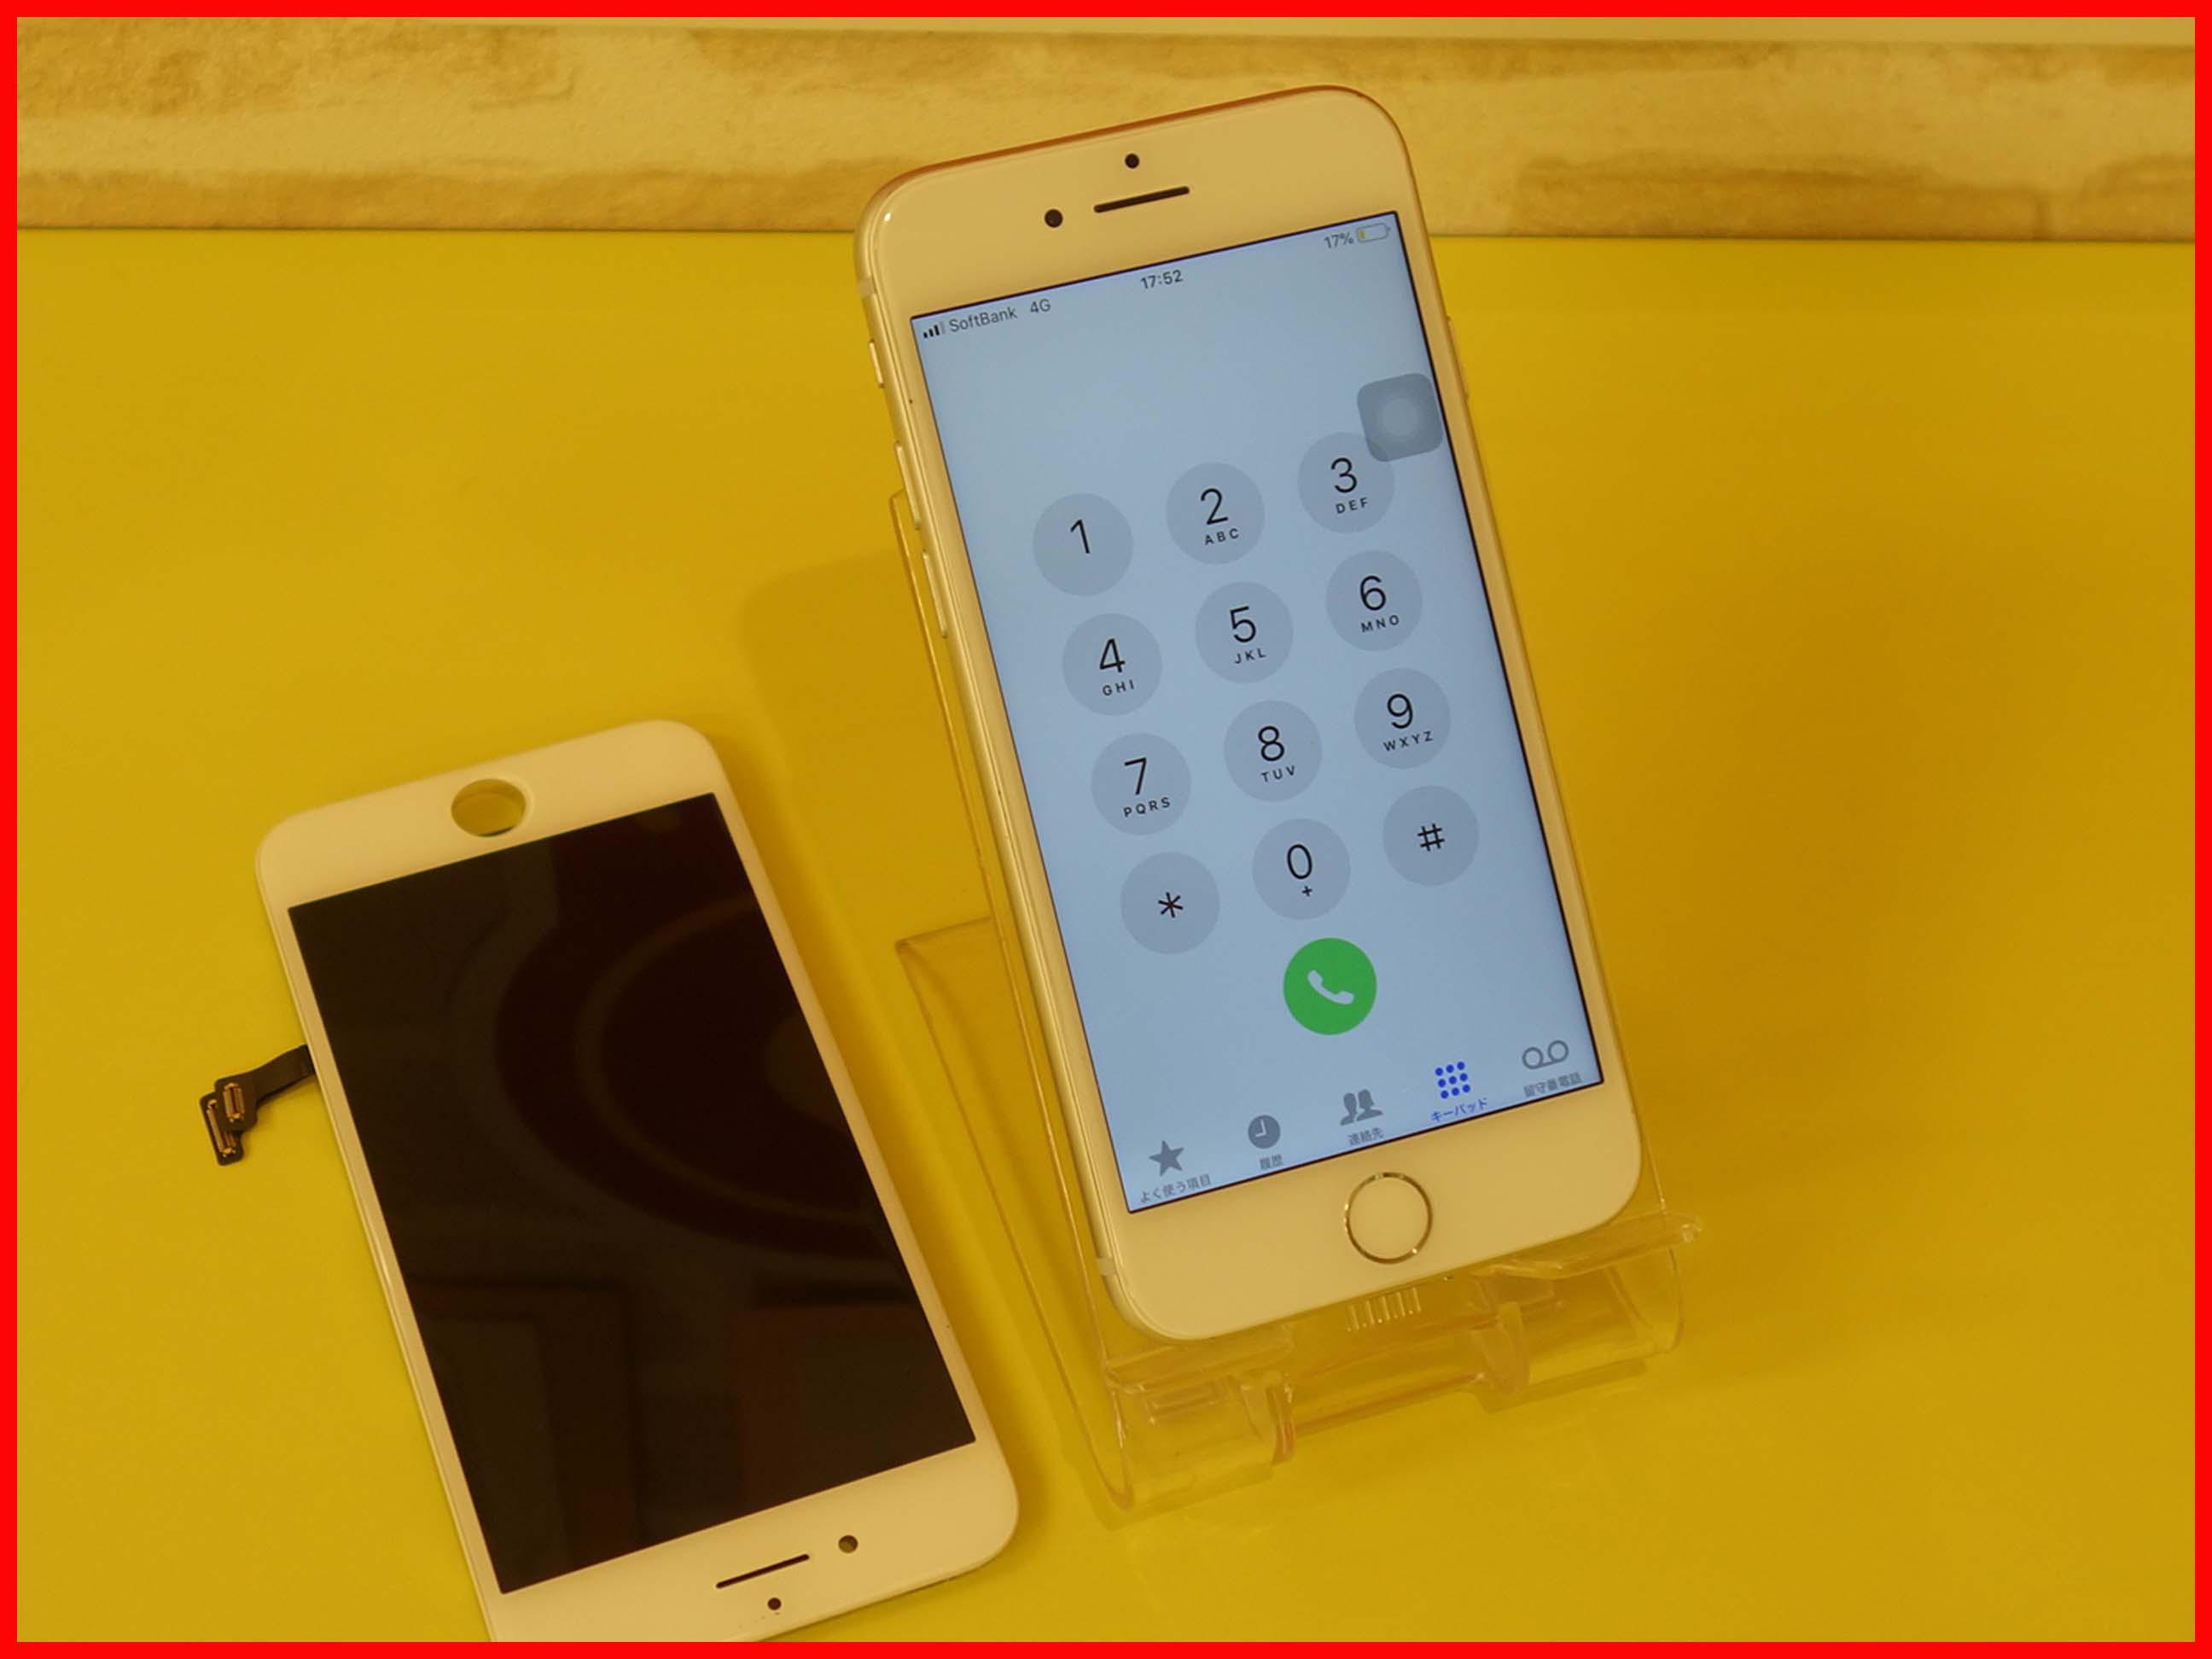 iPhone8の液晶修理に兵庫県よりご来店!アイフォン修理のクイック名古屋